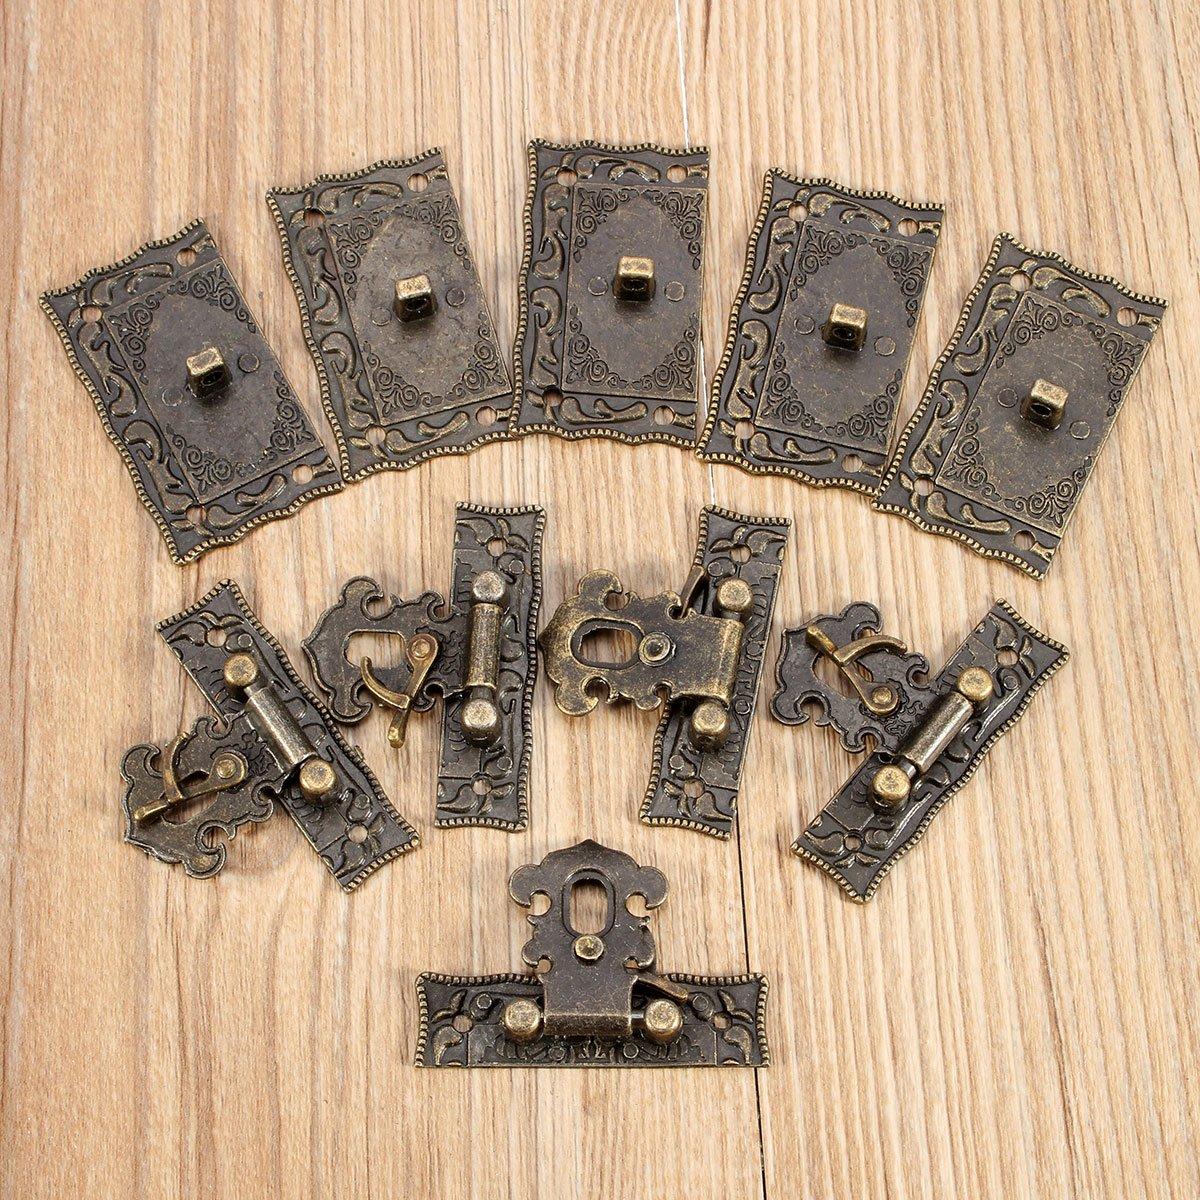 Chenxi tienda 5sets bronce cierre de madera caja maleta Toggle Latch hebillas tono 5.1 cm x2.9 cm ChenXi Shop